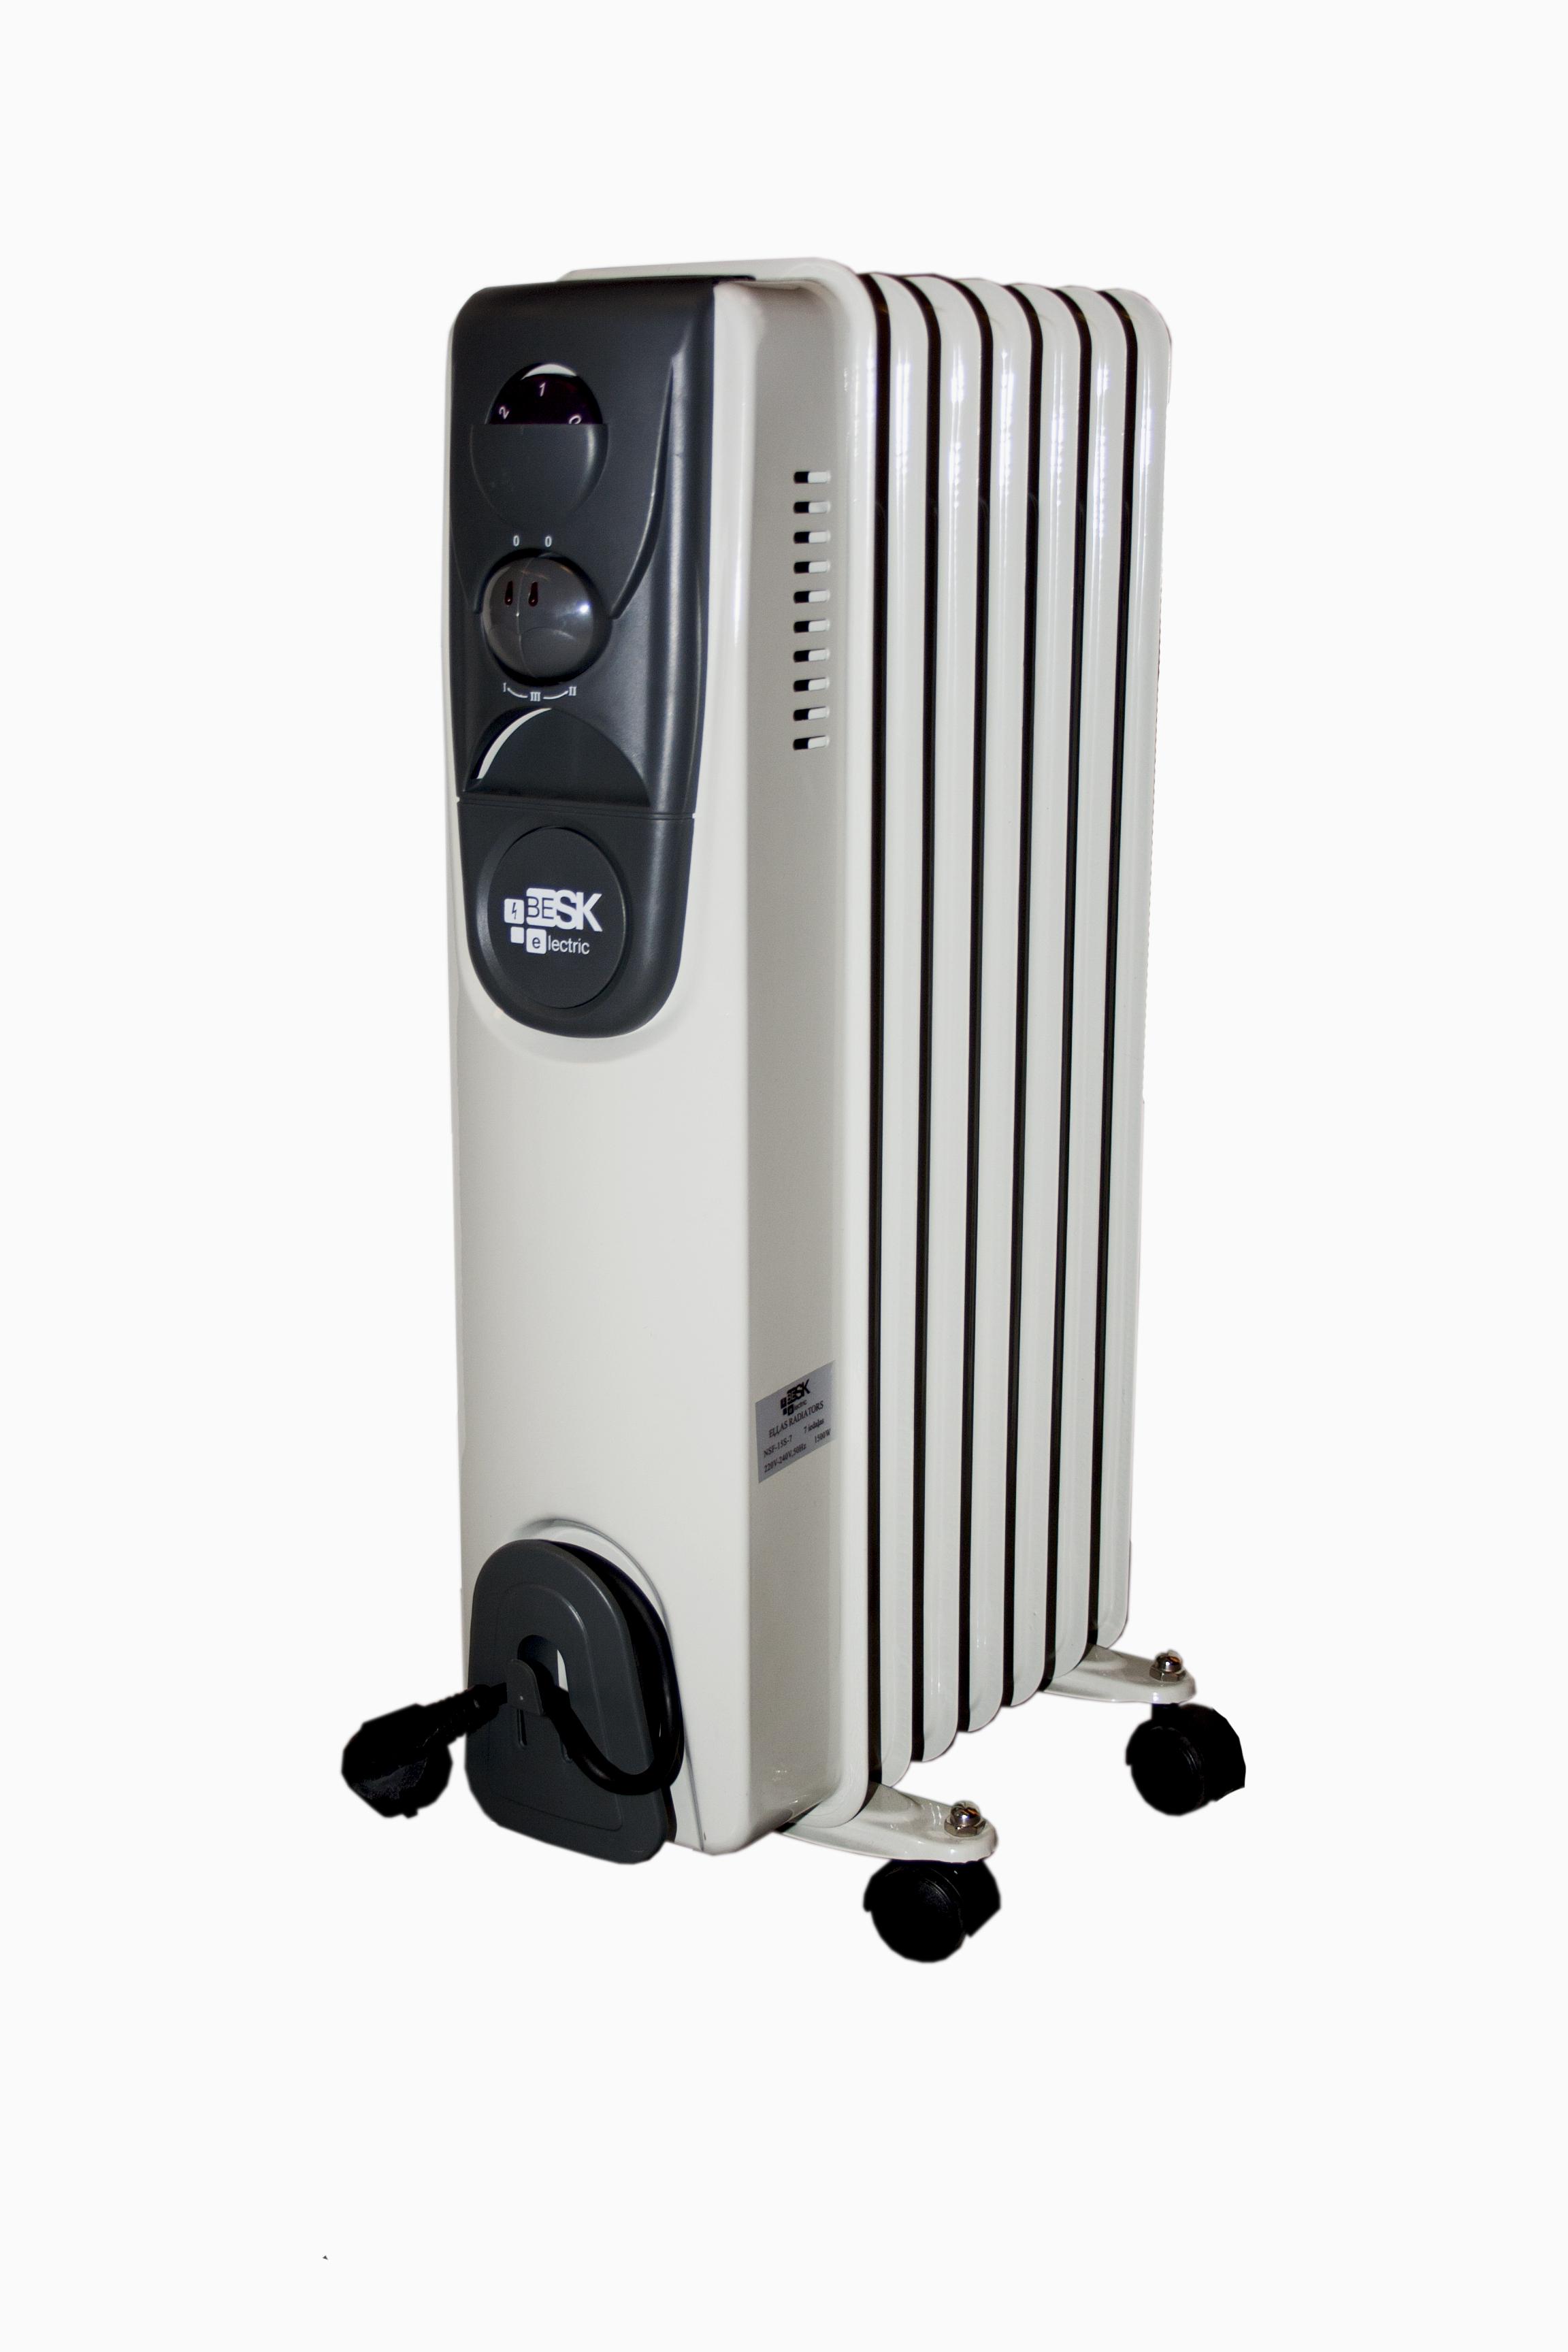 BESK Ellas radiators 7 sekcijas 1500W